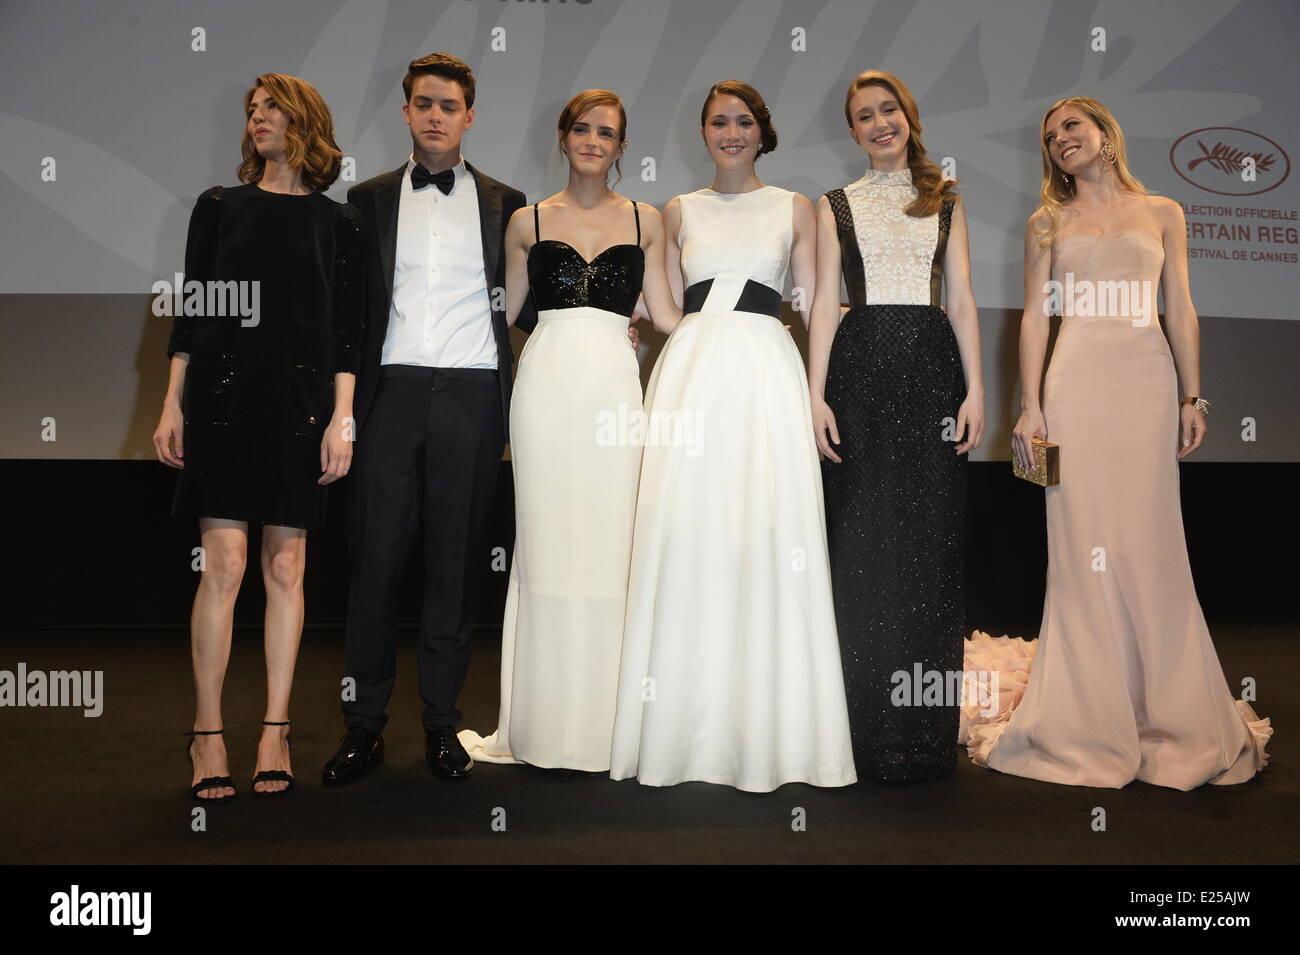 Claire Julien, Taissa Farmiga, katie Chang, Isrtael Broussard, Emma Watson and Sofia Coppola. 'Jeune et Jolie' - Stock Image